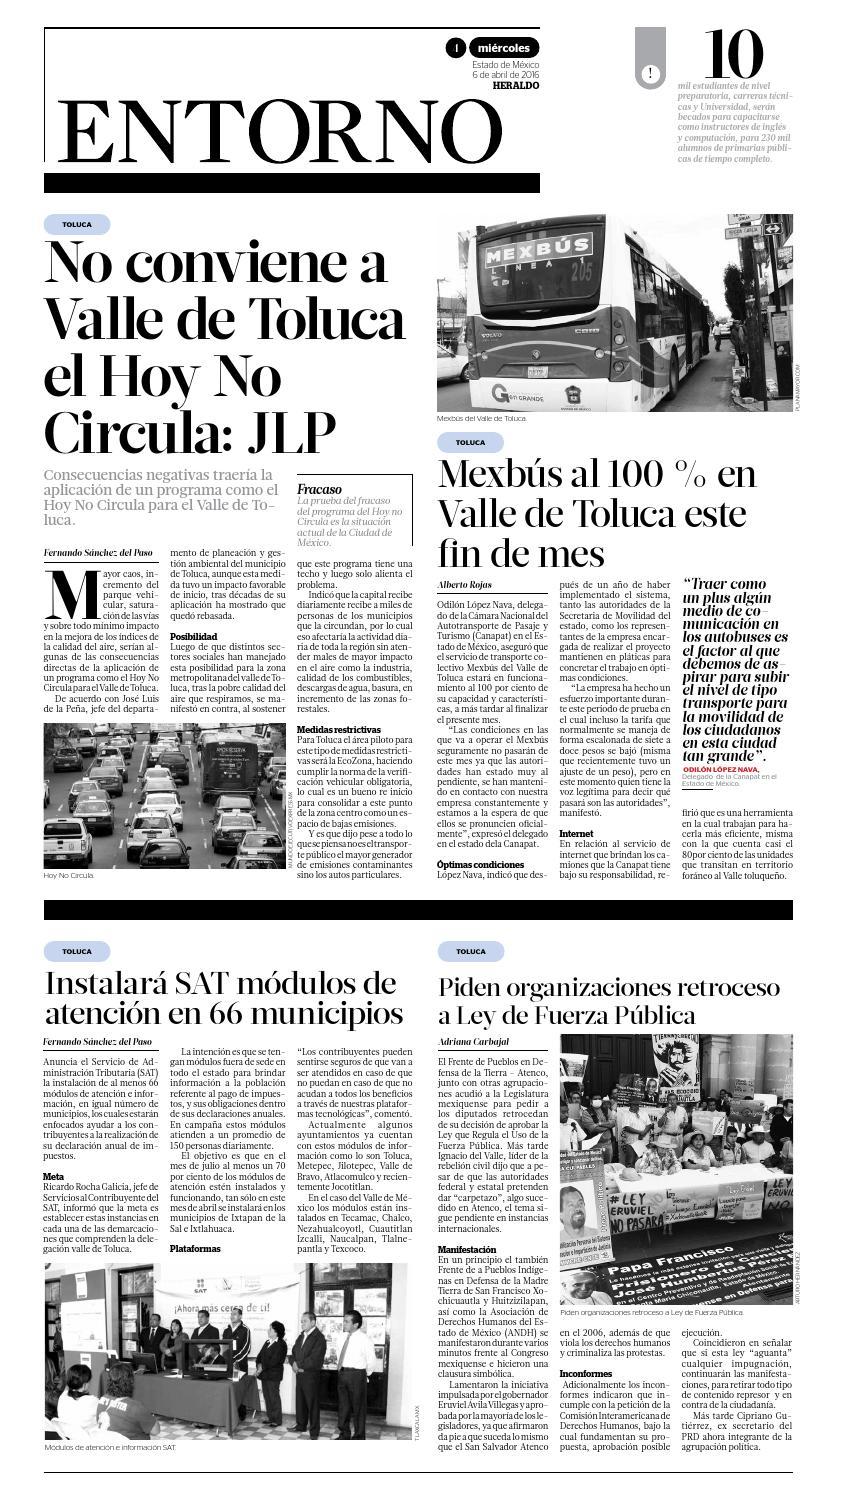 Miércoles 6 Abril 2016 By Heraldo Estado De México Issuu